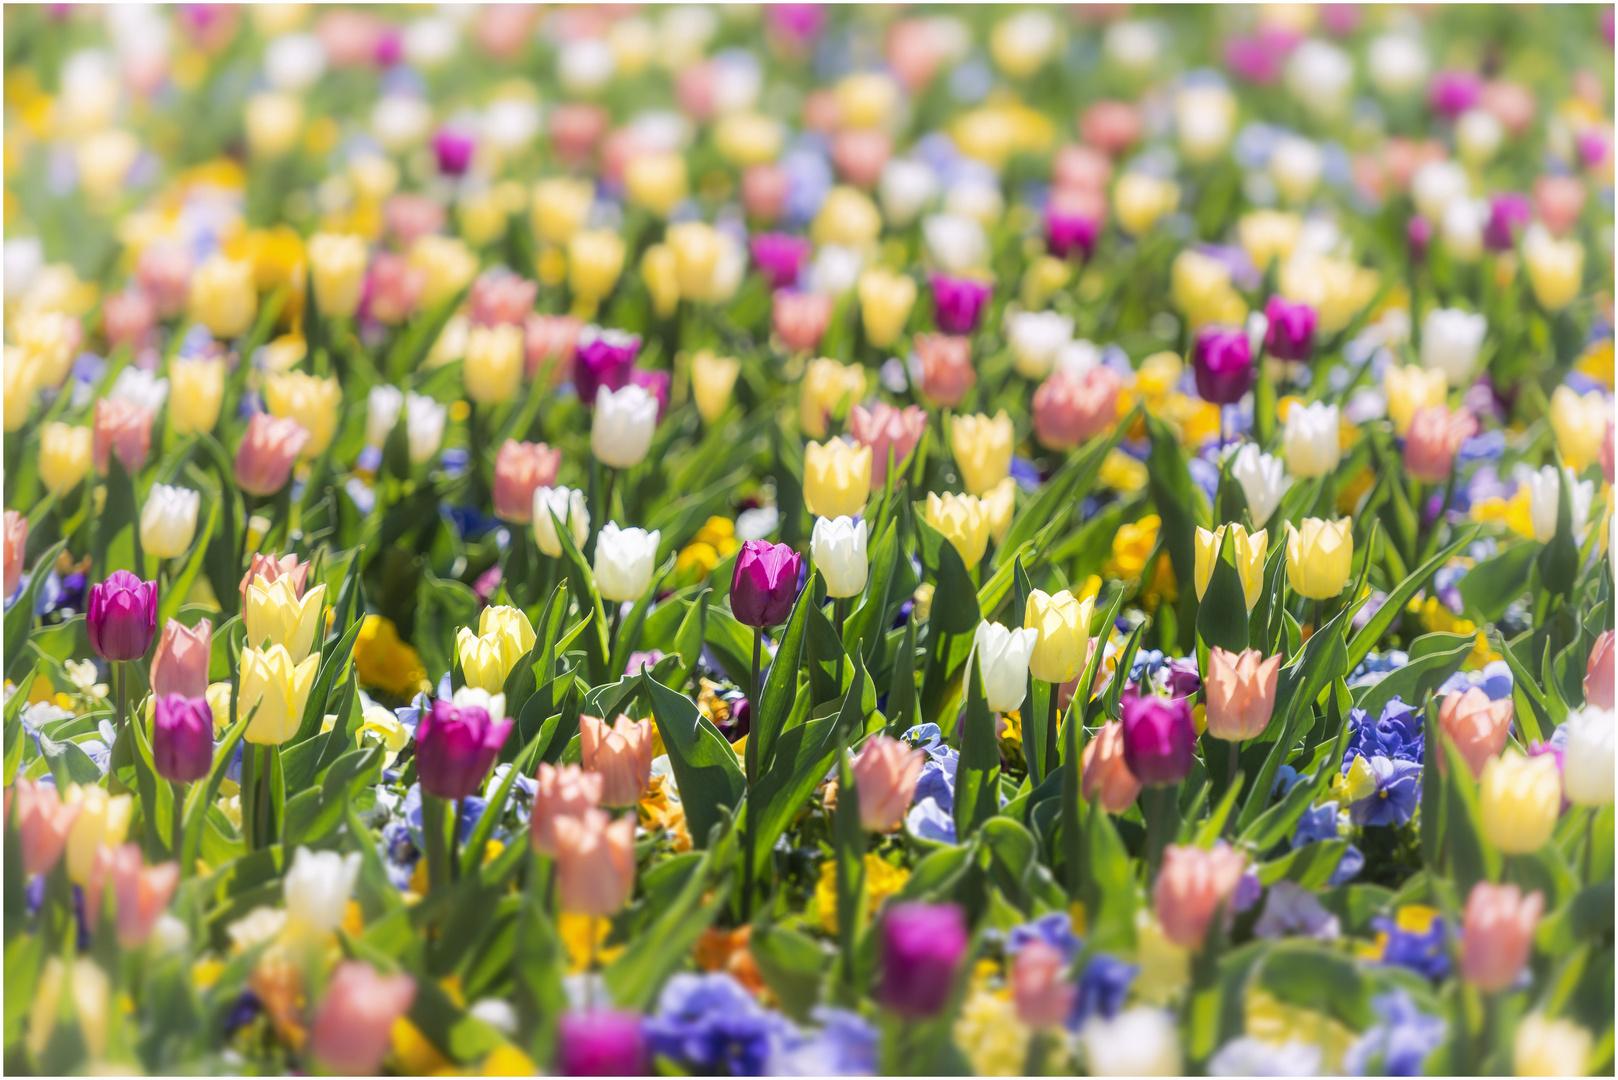 Frühling, ja du bist\'s ! Foto & Bild | outdoor, tulpen, frühling ...